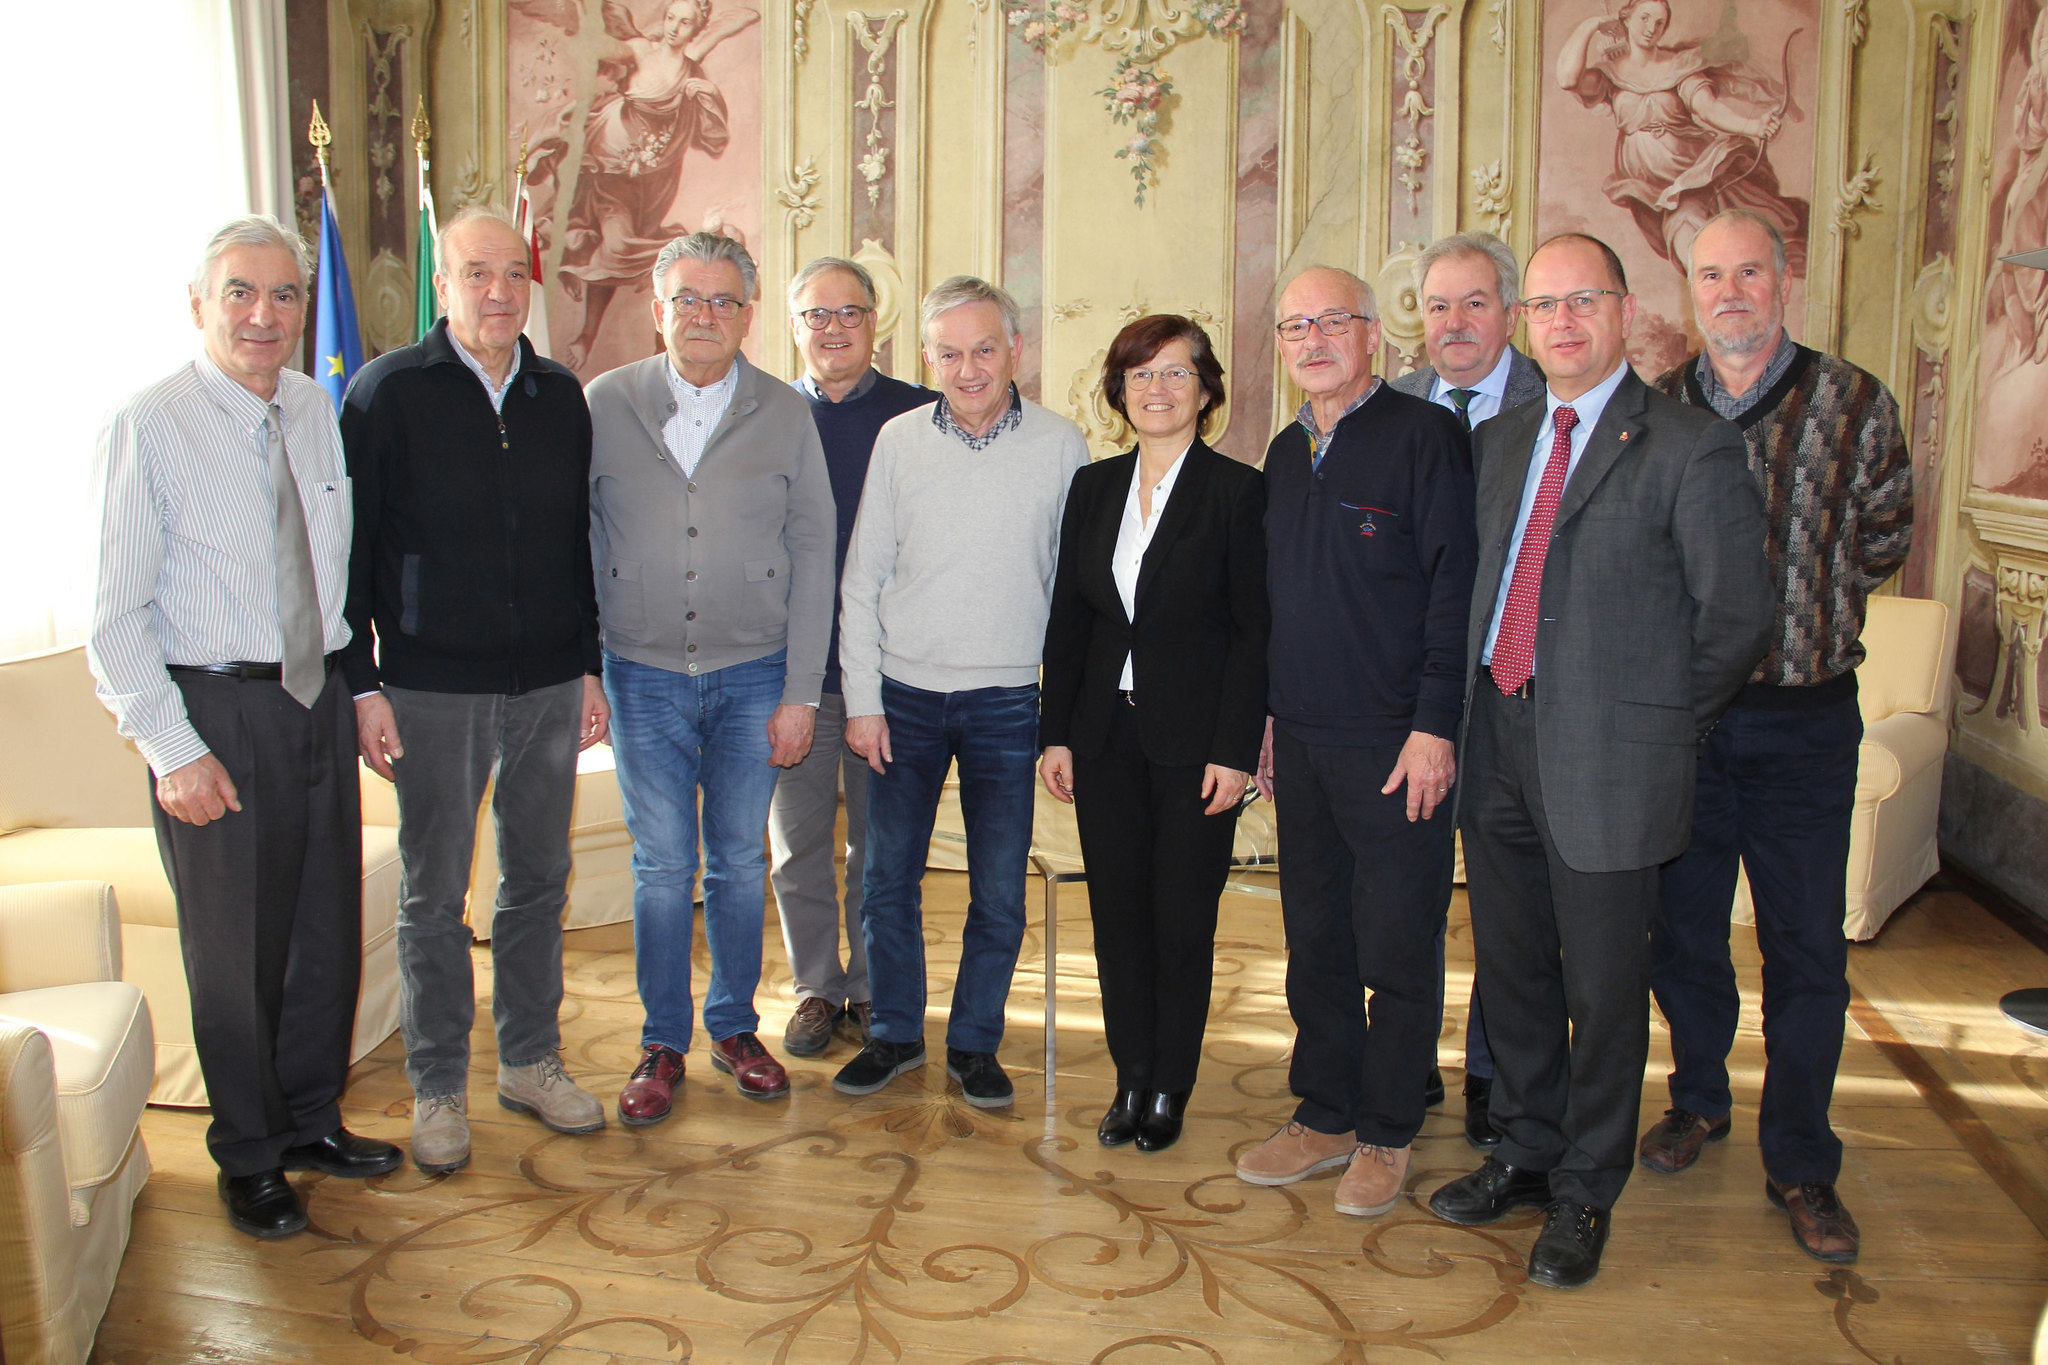 2019 - Incontro col Presidente Consiglio Provinciale Walter Kaswalder